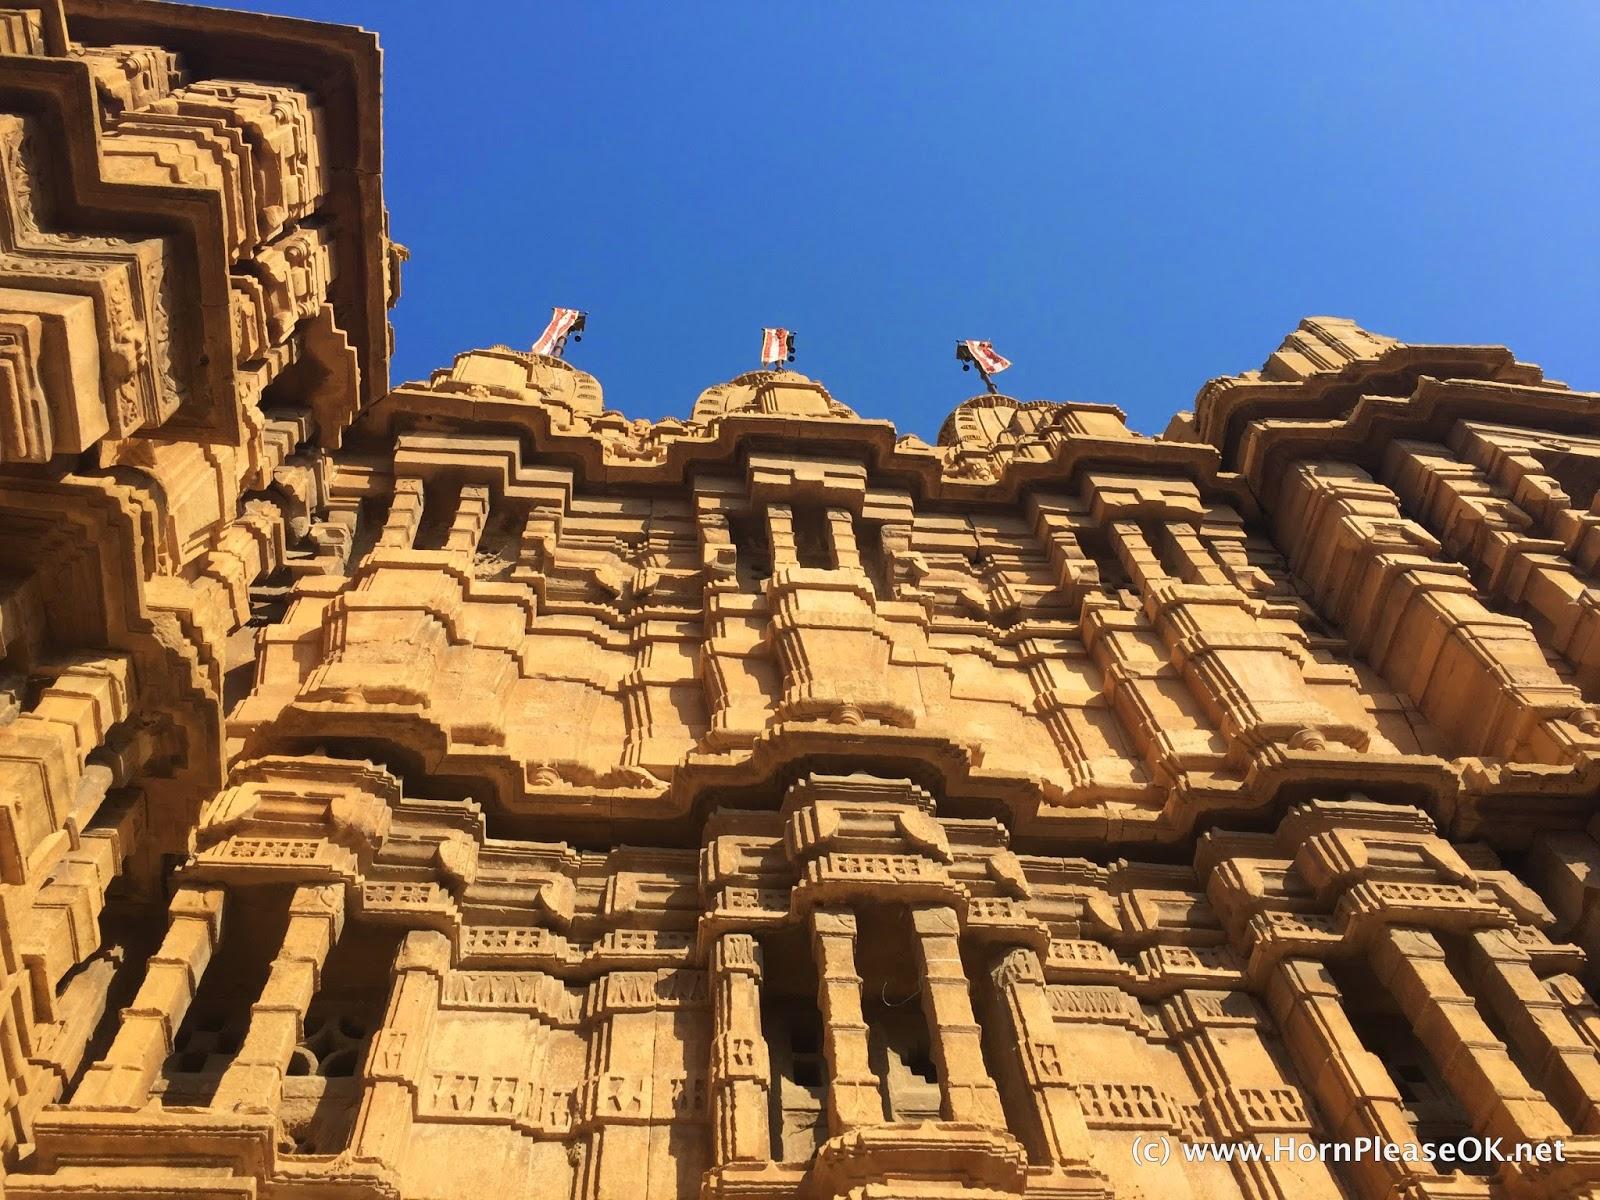 Jain temples inside Jaisalmer Fort